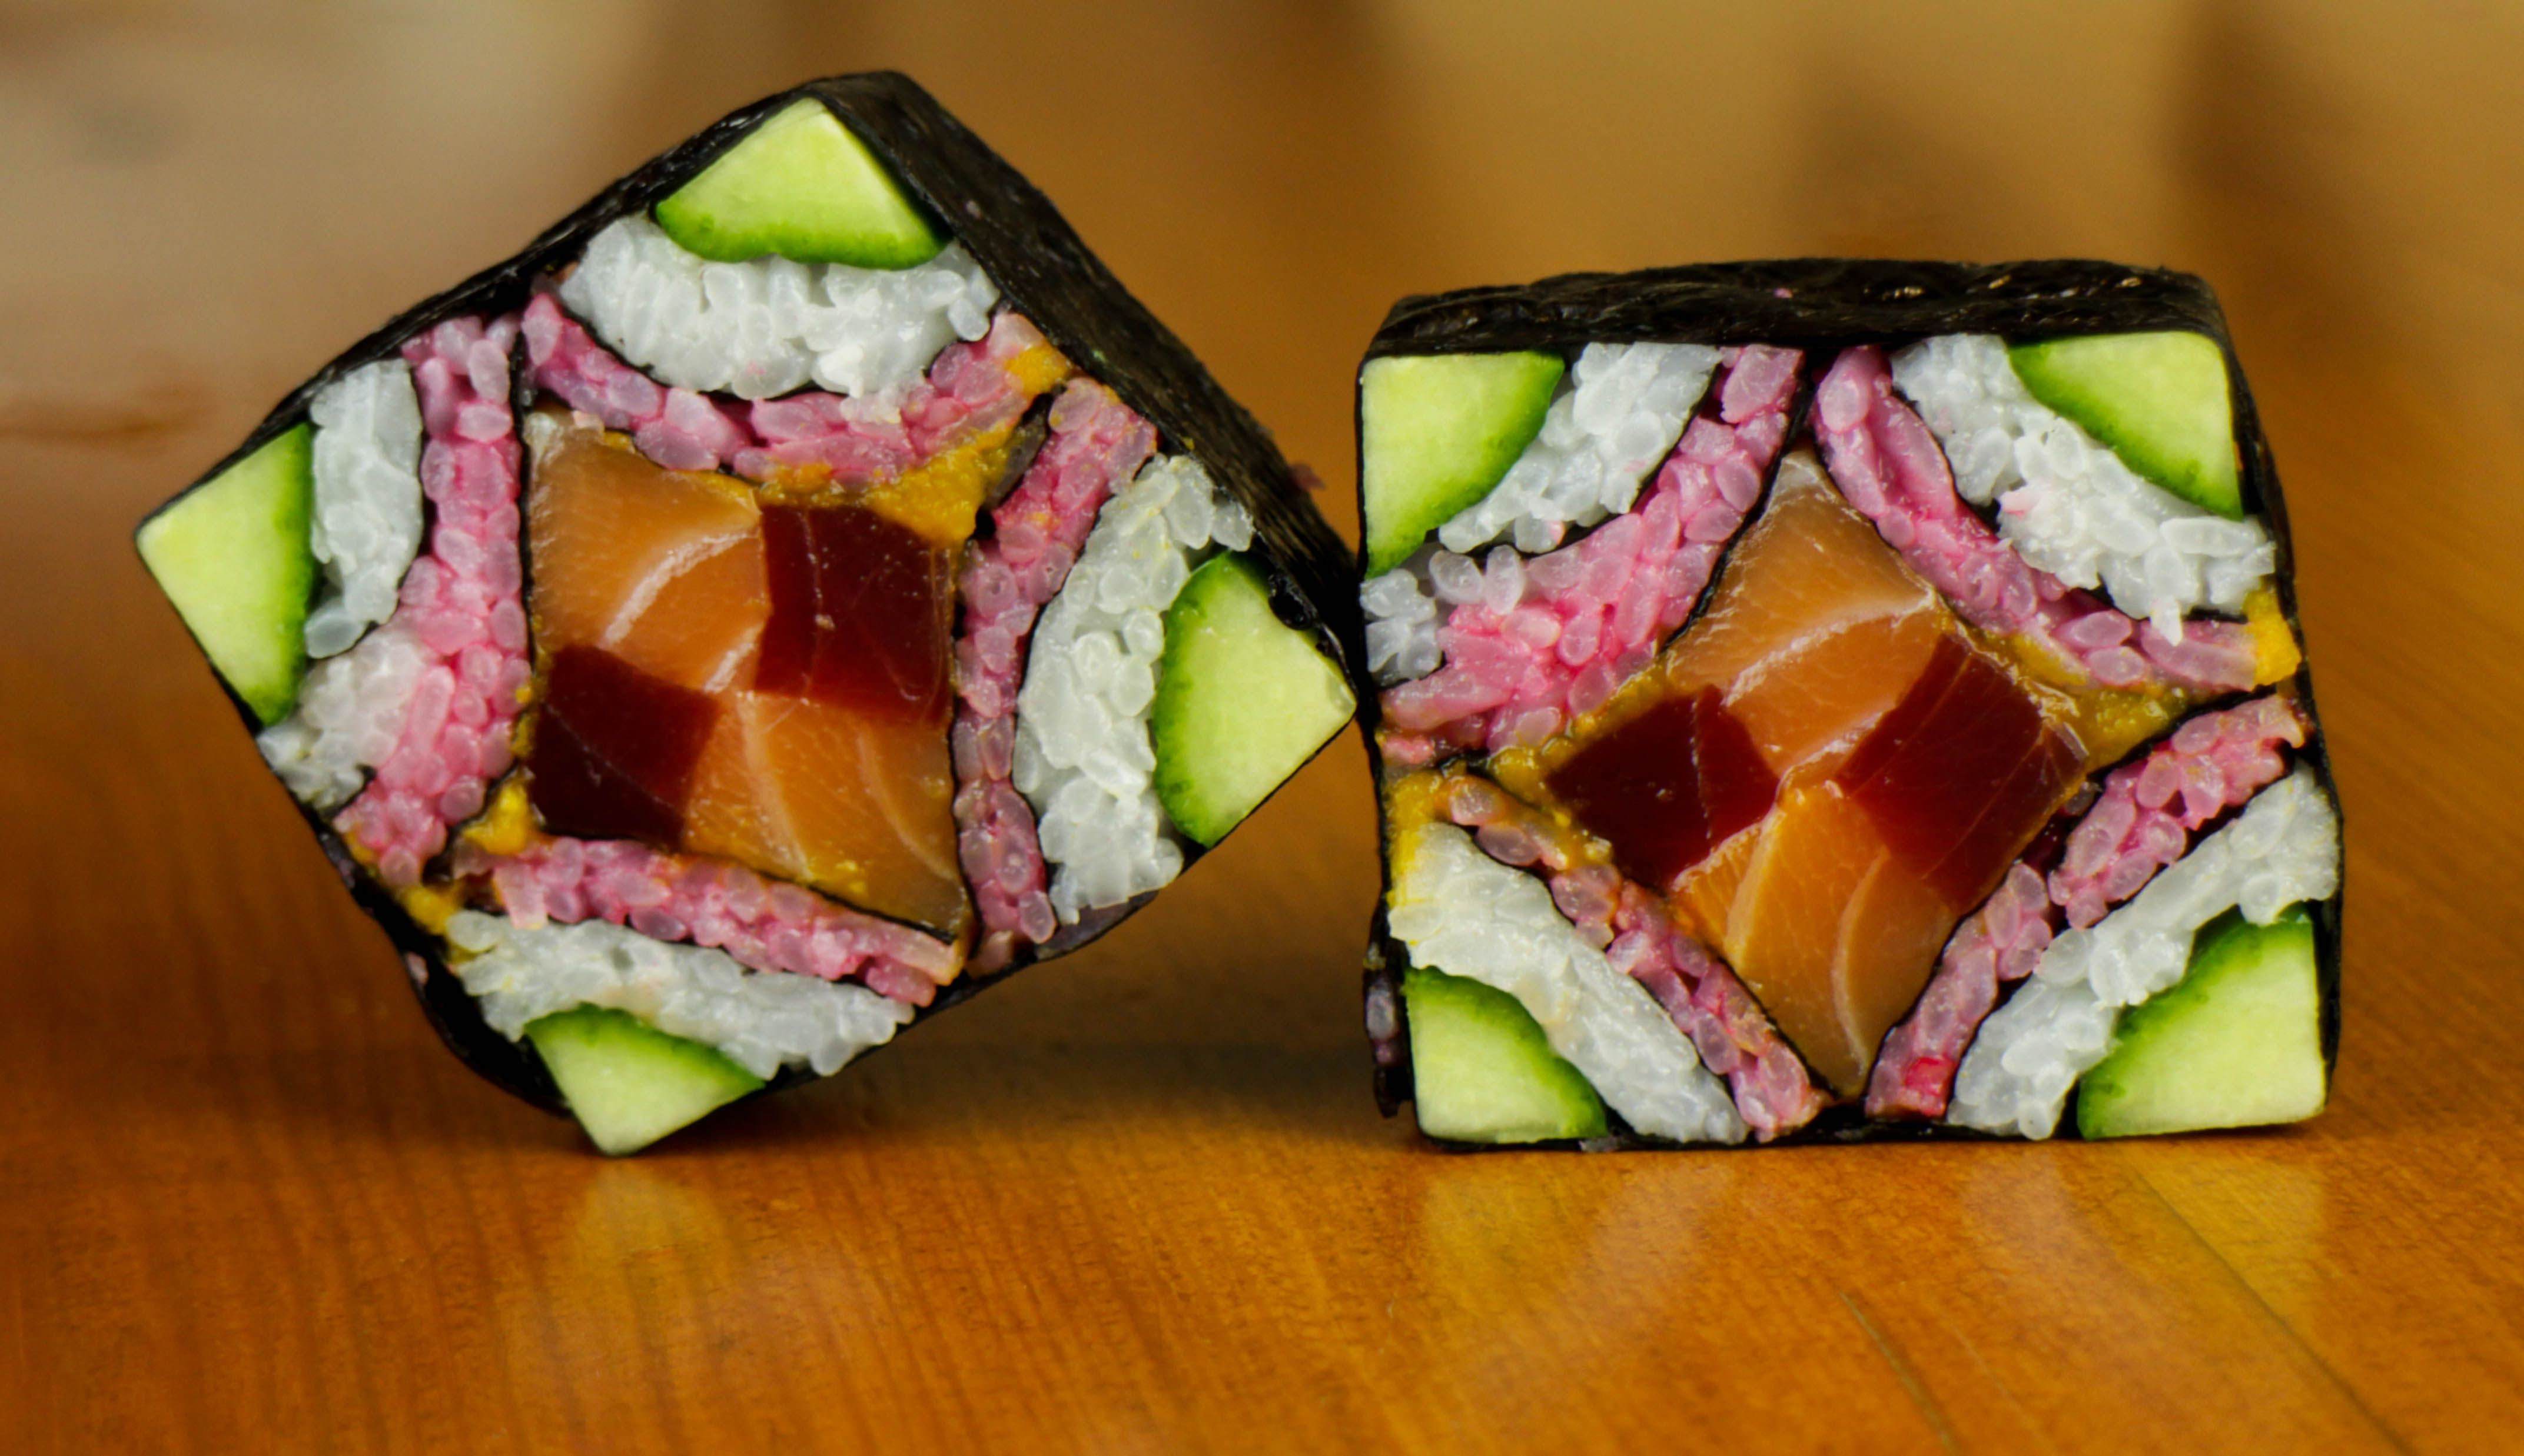 mosaic sushi roll - japanese food